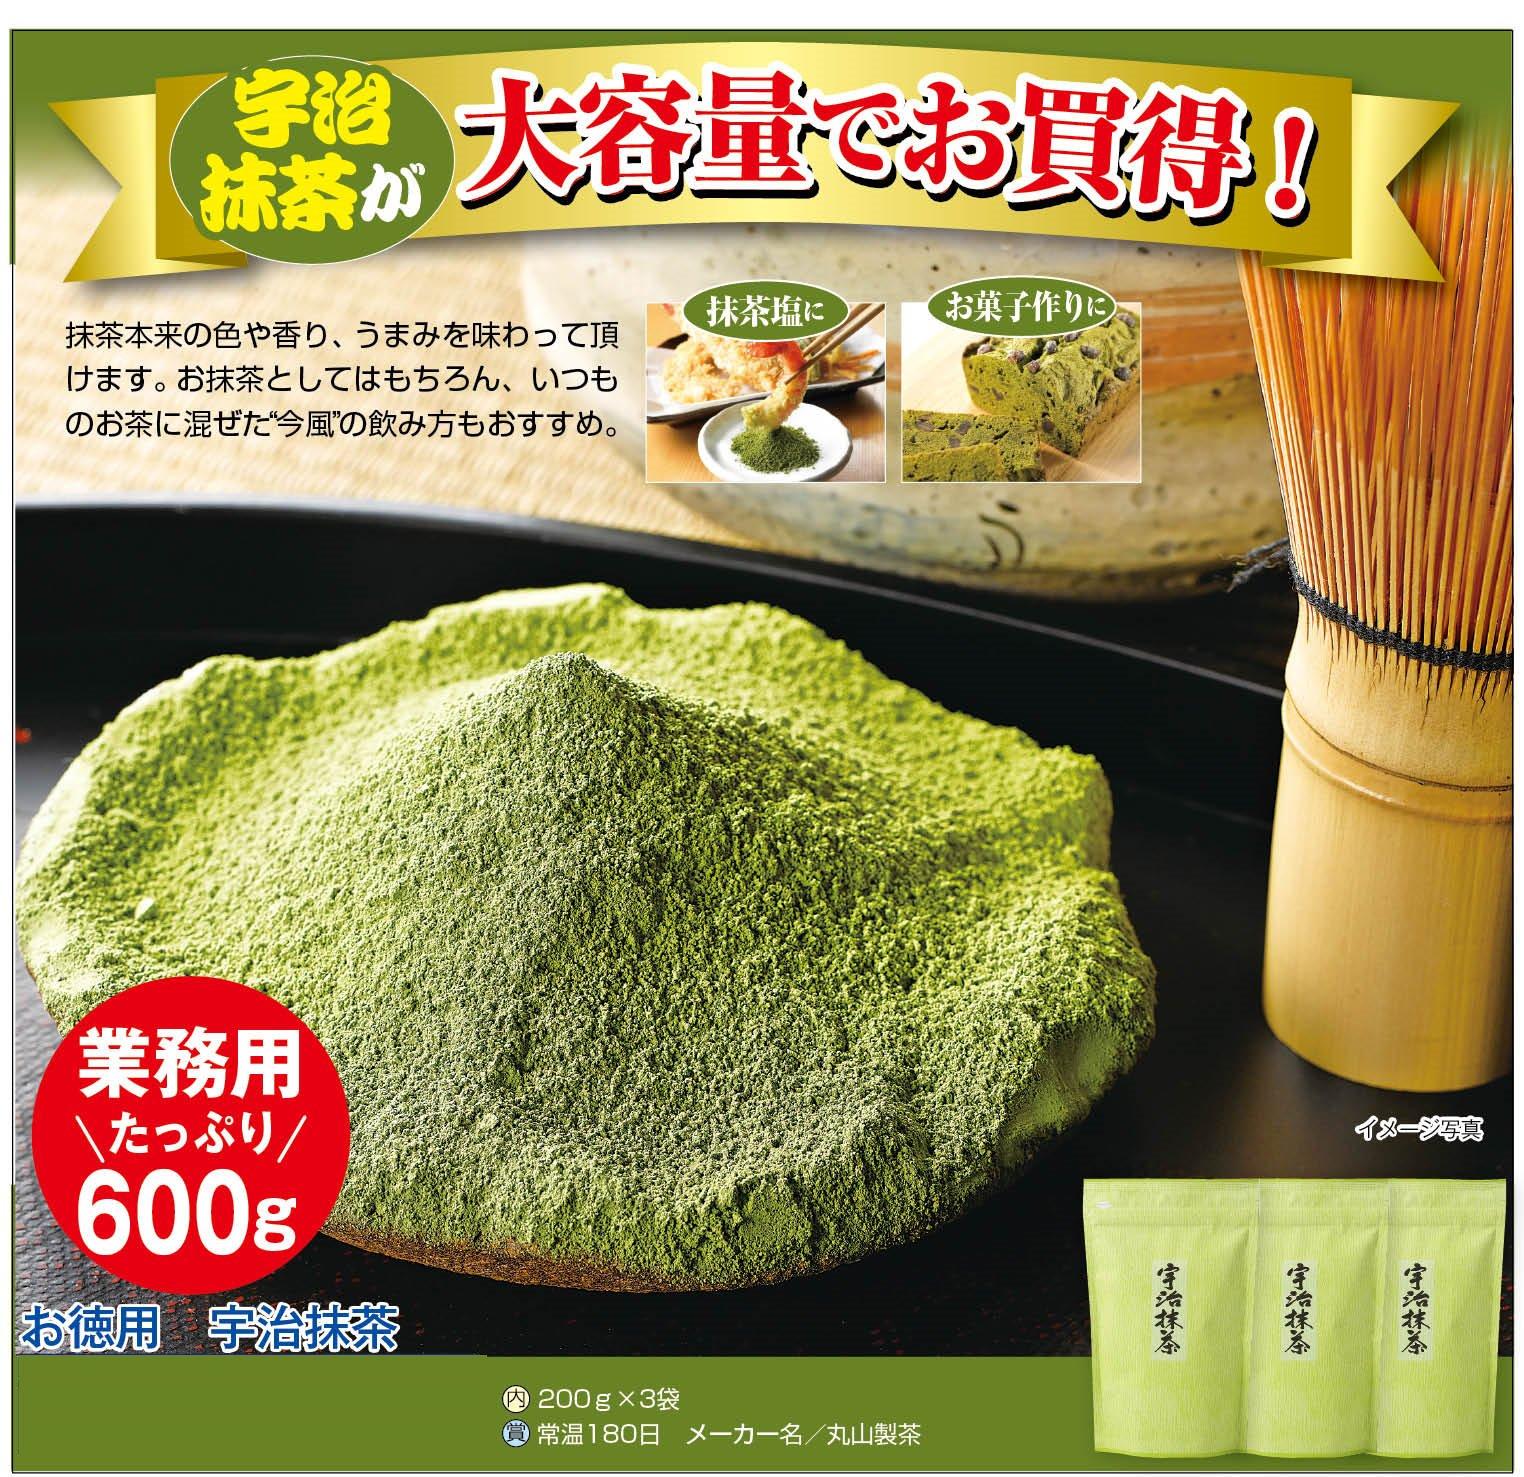 お徳用 宇治抹茶 200g×3袋